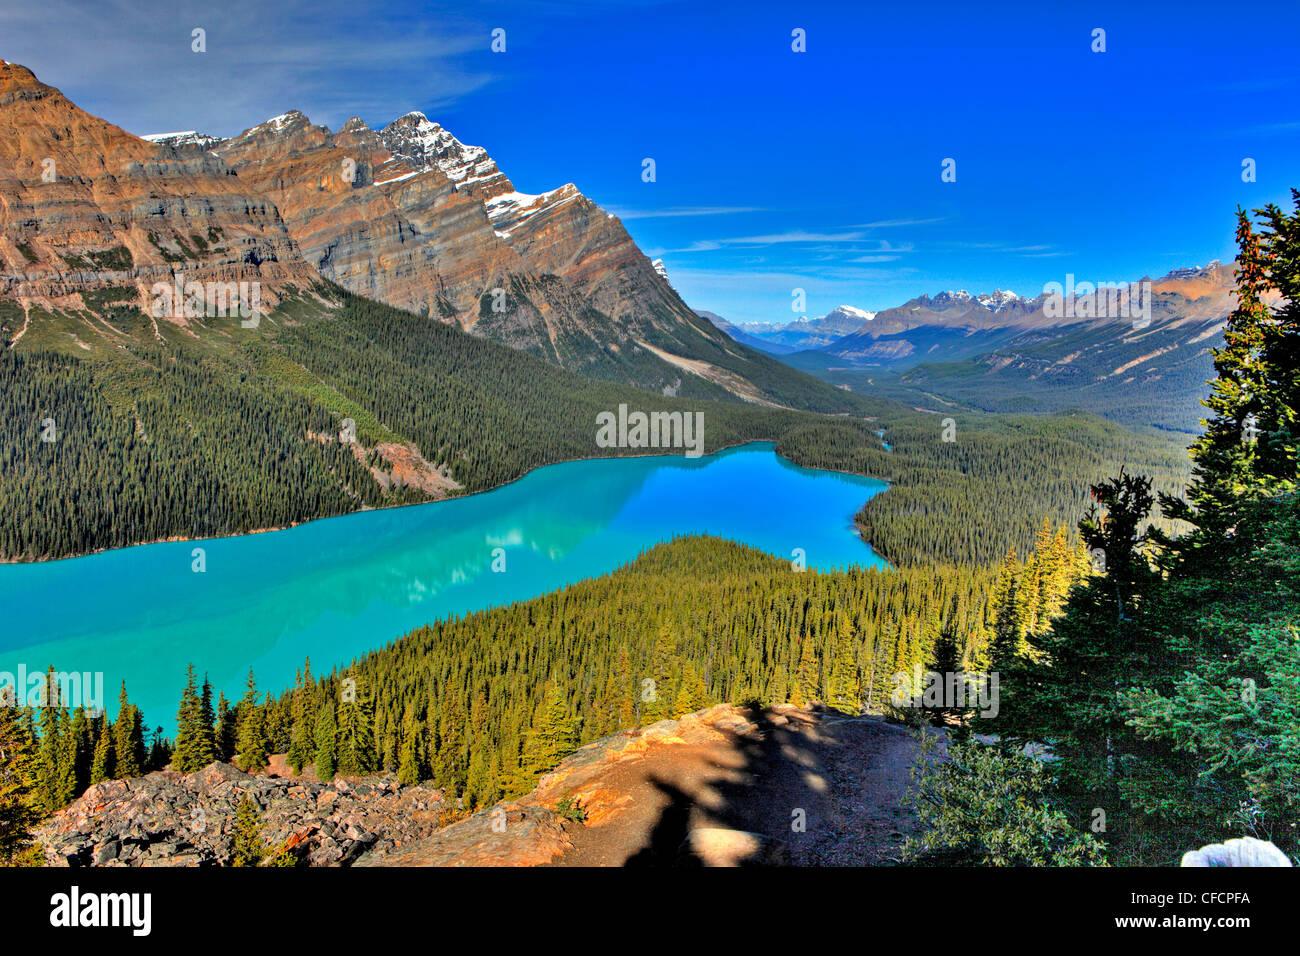 Lago Peyto, Parque Nacional de Banff, Alberta, Canadá Imagen De Stock